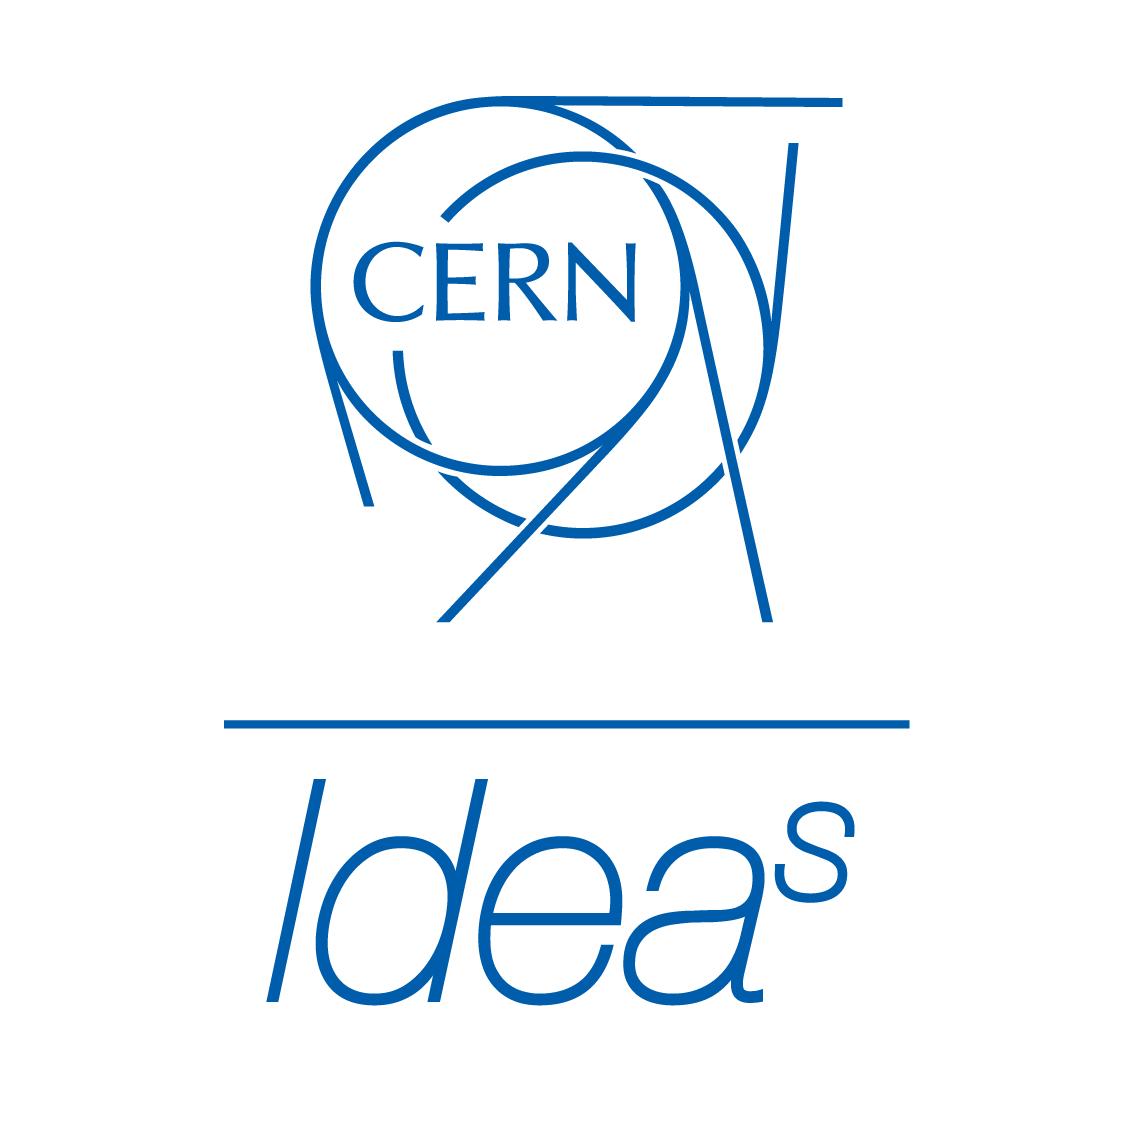 CERN Ideasquare